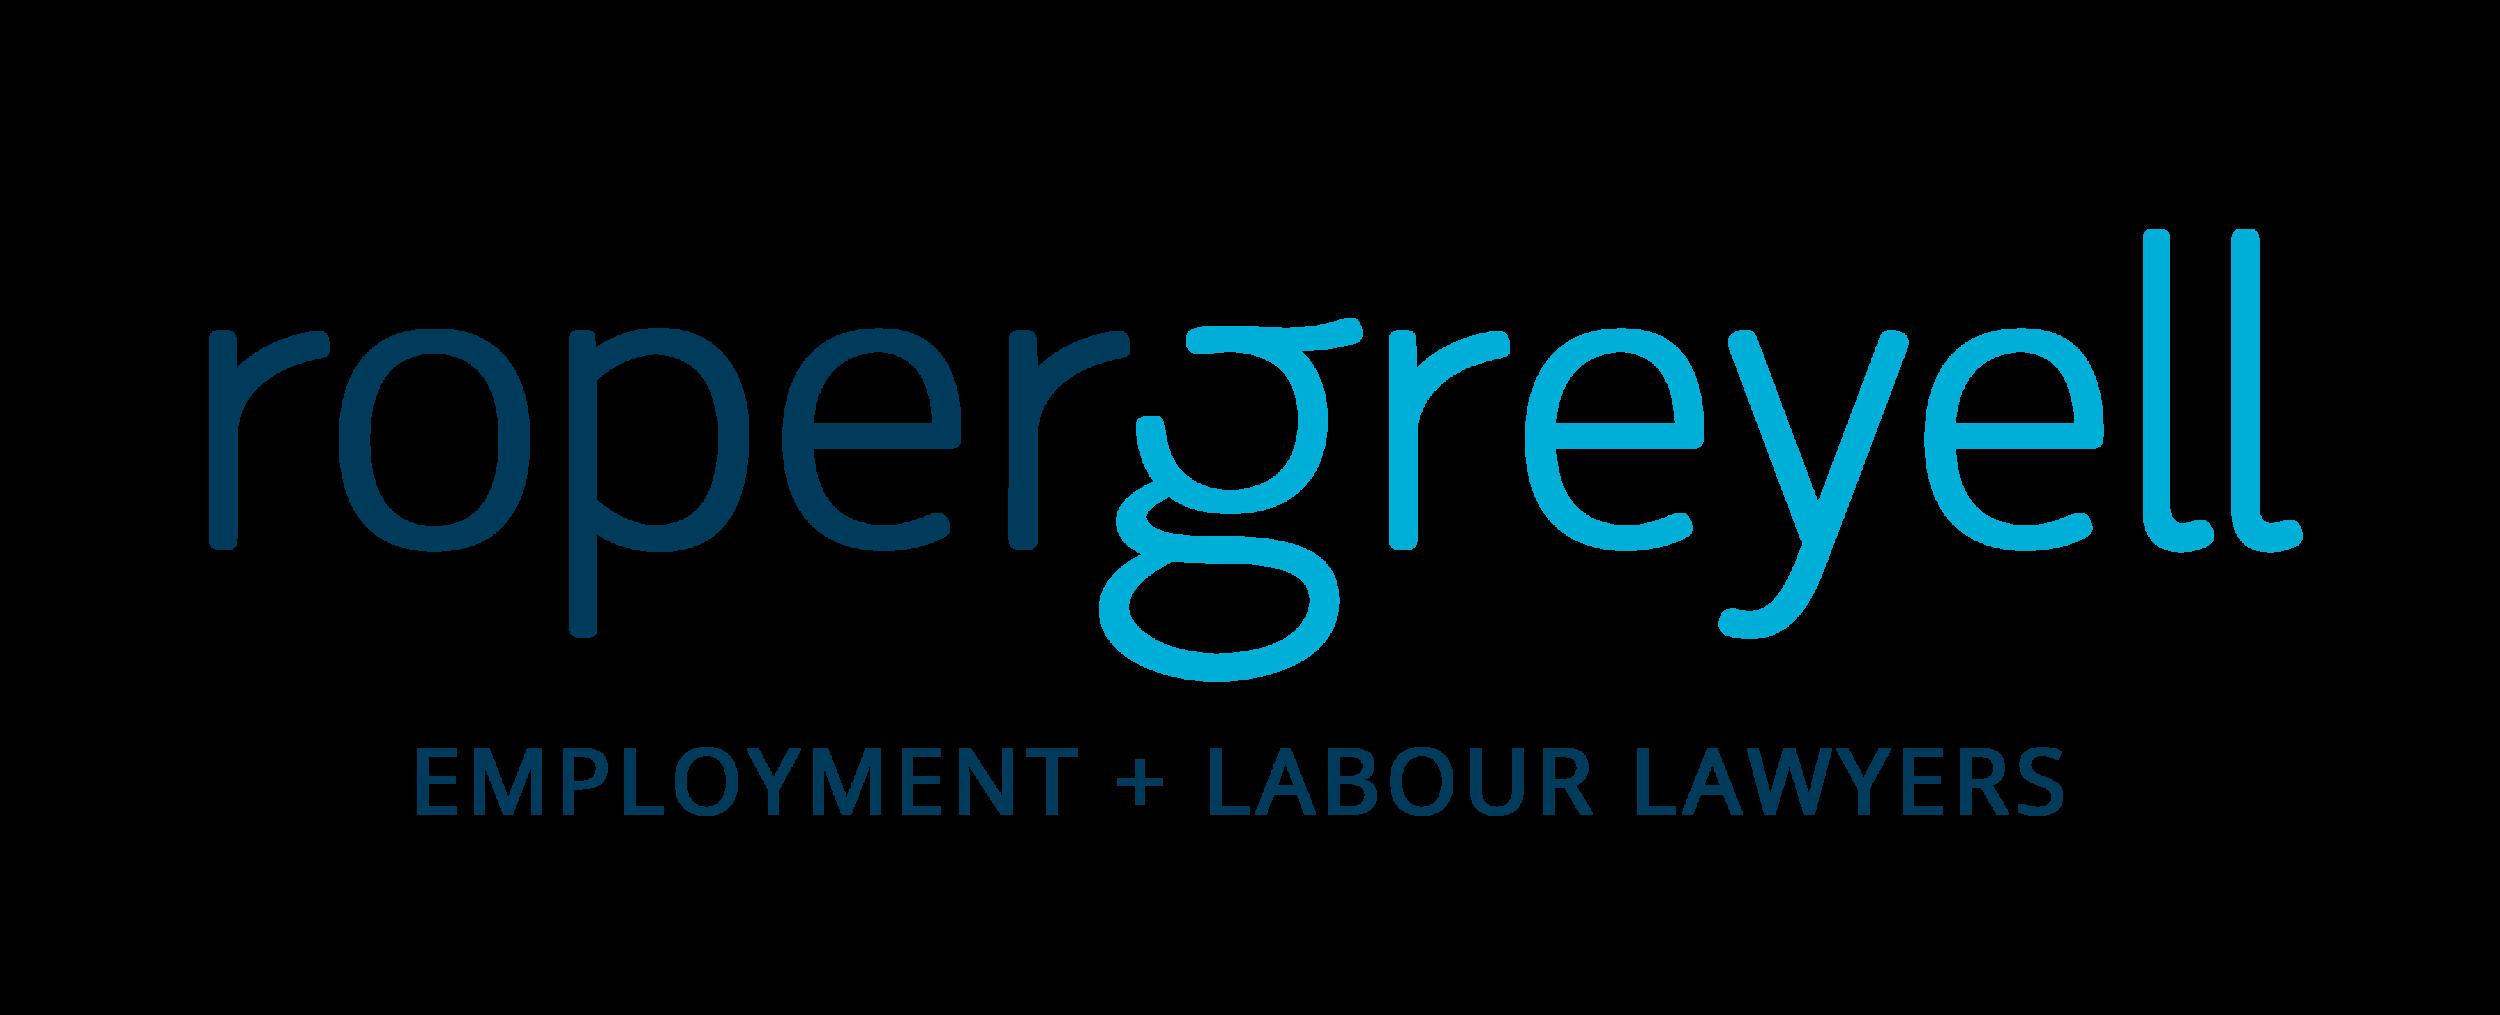 Ropergreyell_stacked_logo_RGB.png